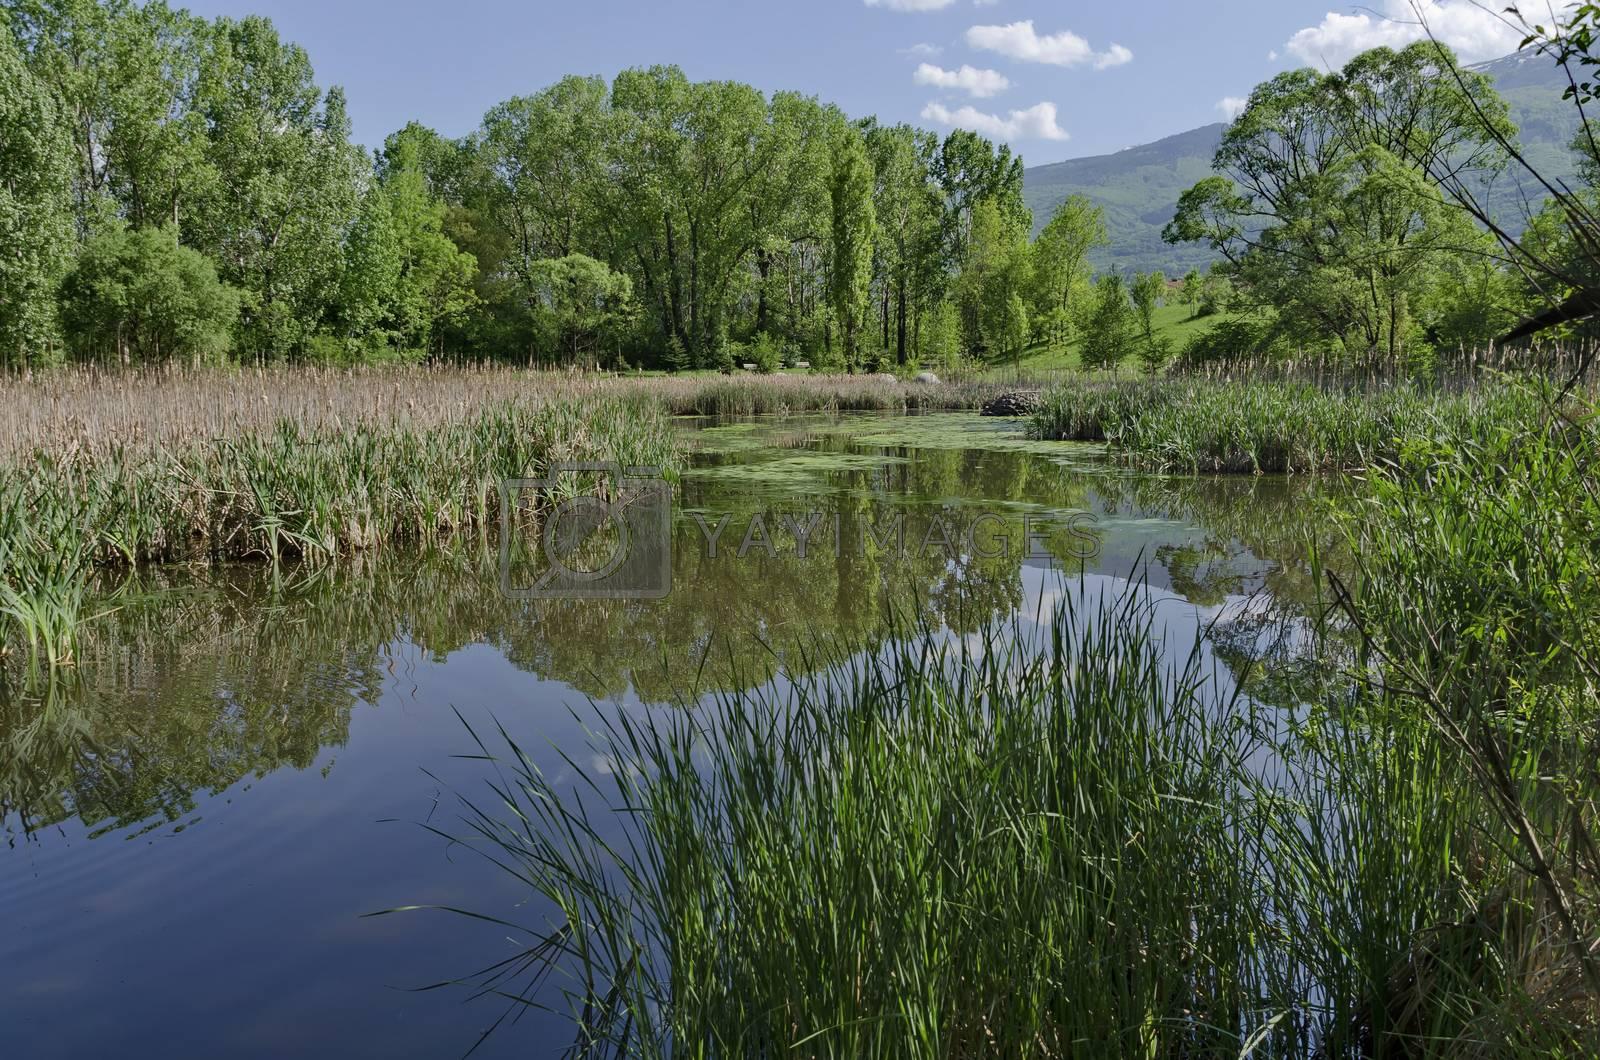 Small dam in the beautiful South park, Sofia, Bulgaria